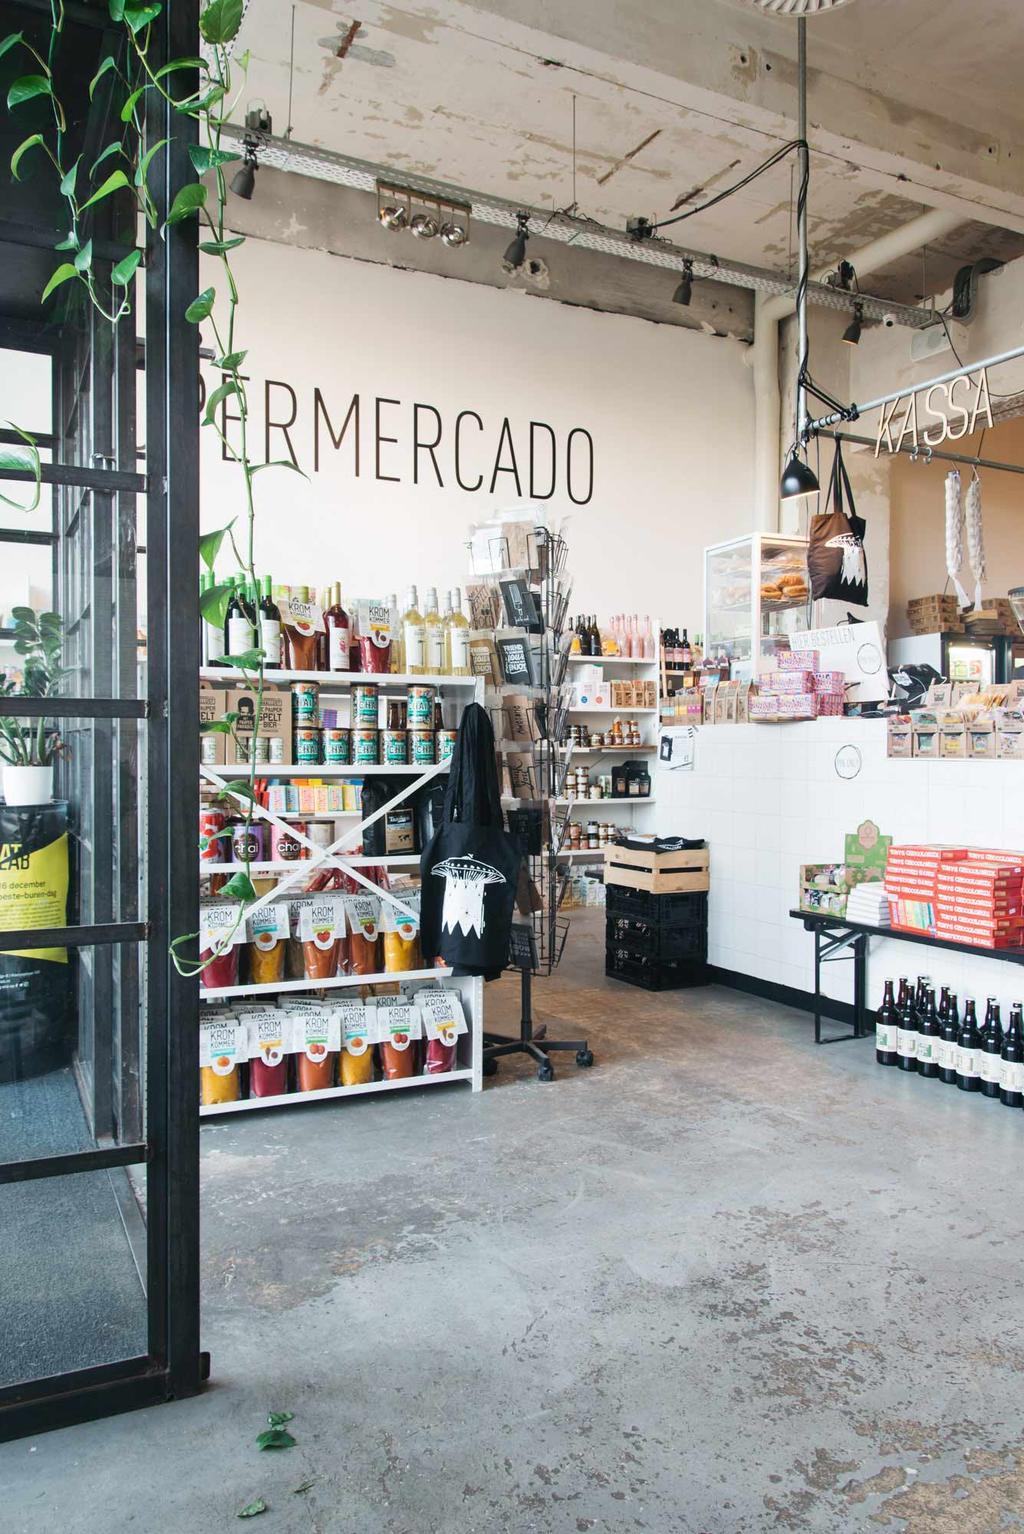 bio supermercado onder de leidingstraat remade with love